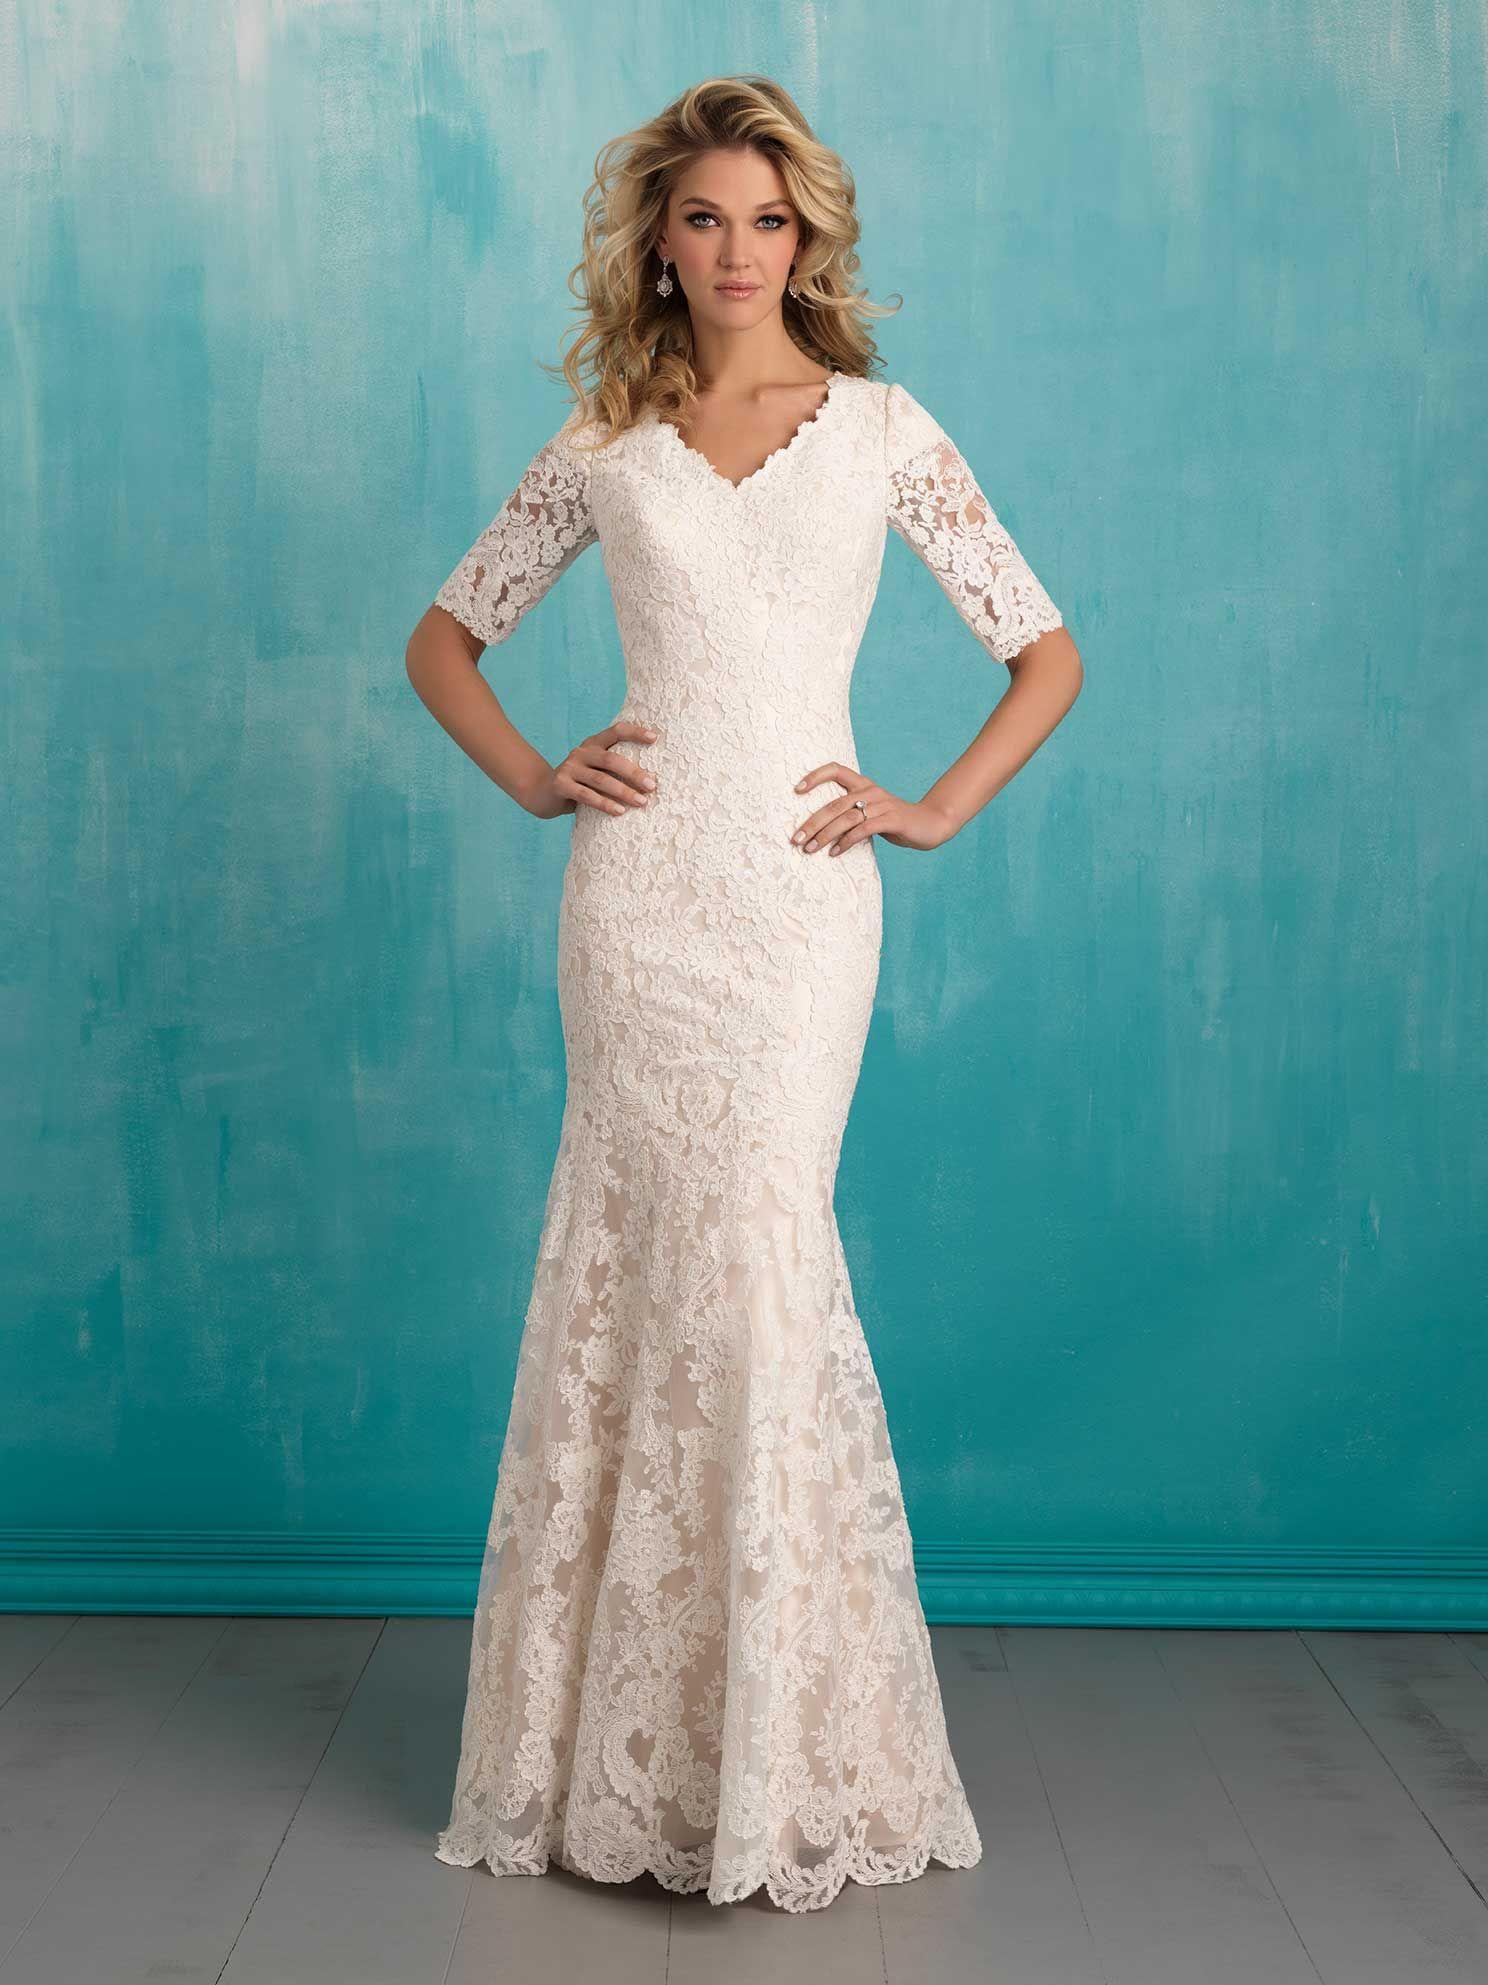 Blue camo wedding dresses   Gorgeous Modest Wedding Dresses  For my girl  Pinterest